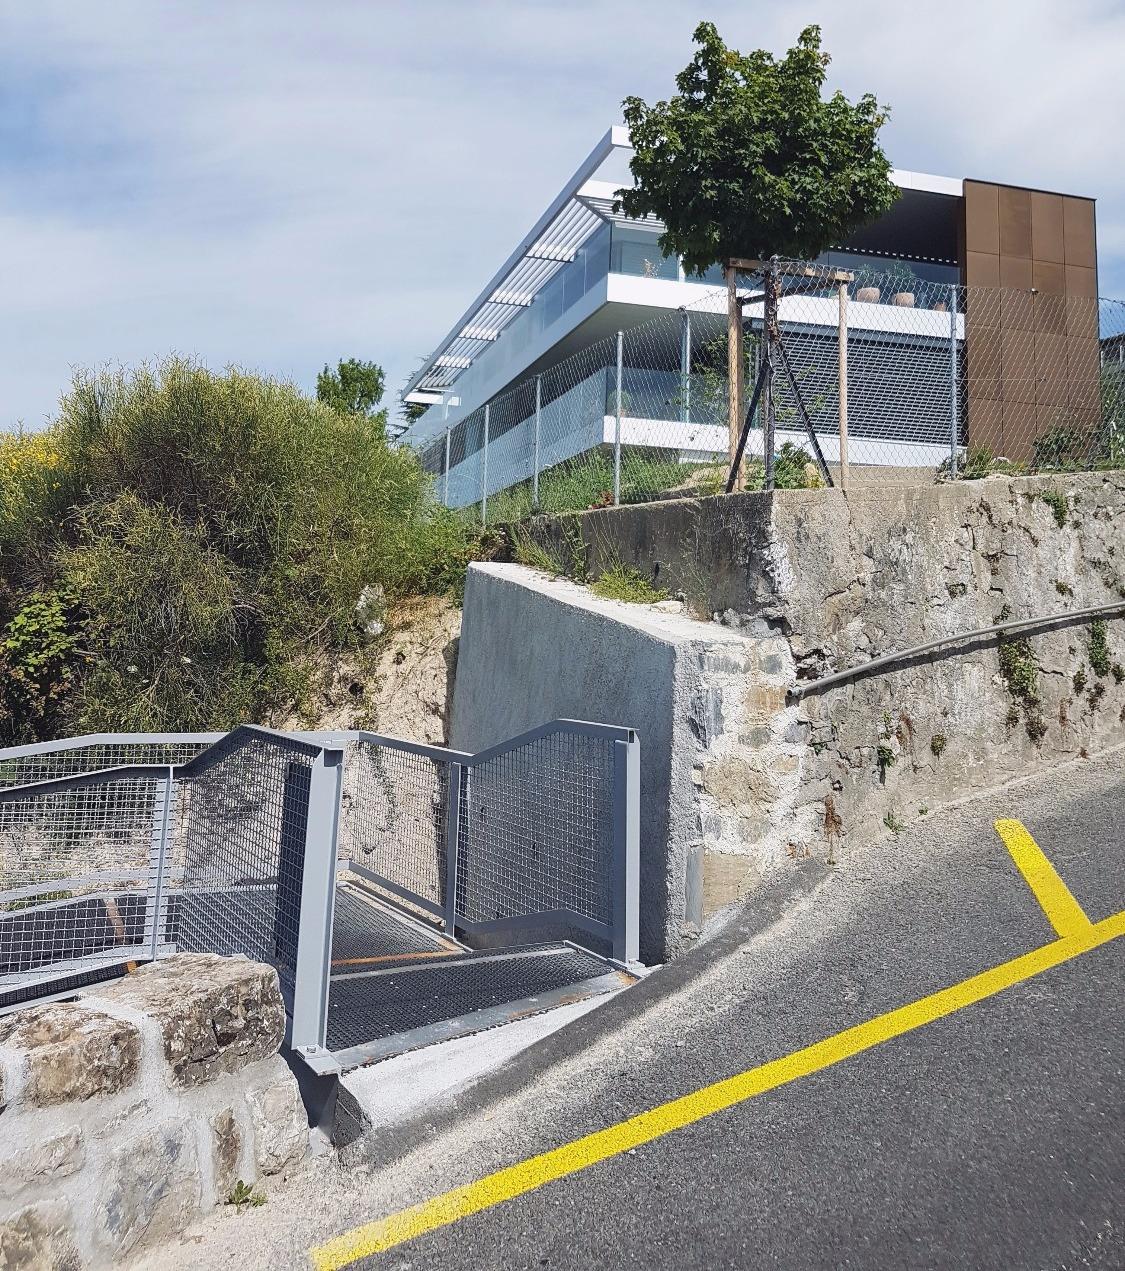 Passerelle_piétonne_CFF_Cornaz_Fontanellaz_Construction3_edited